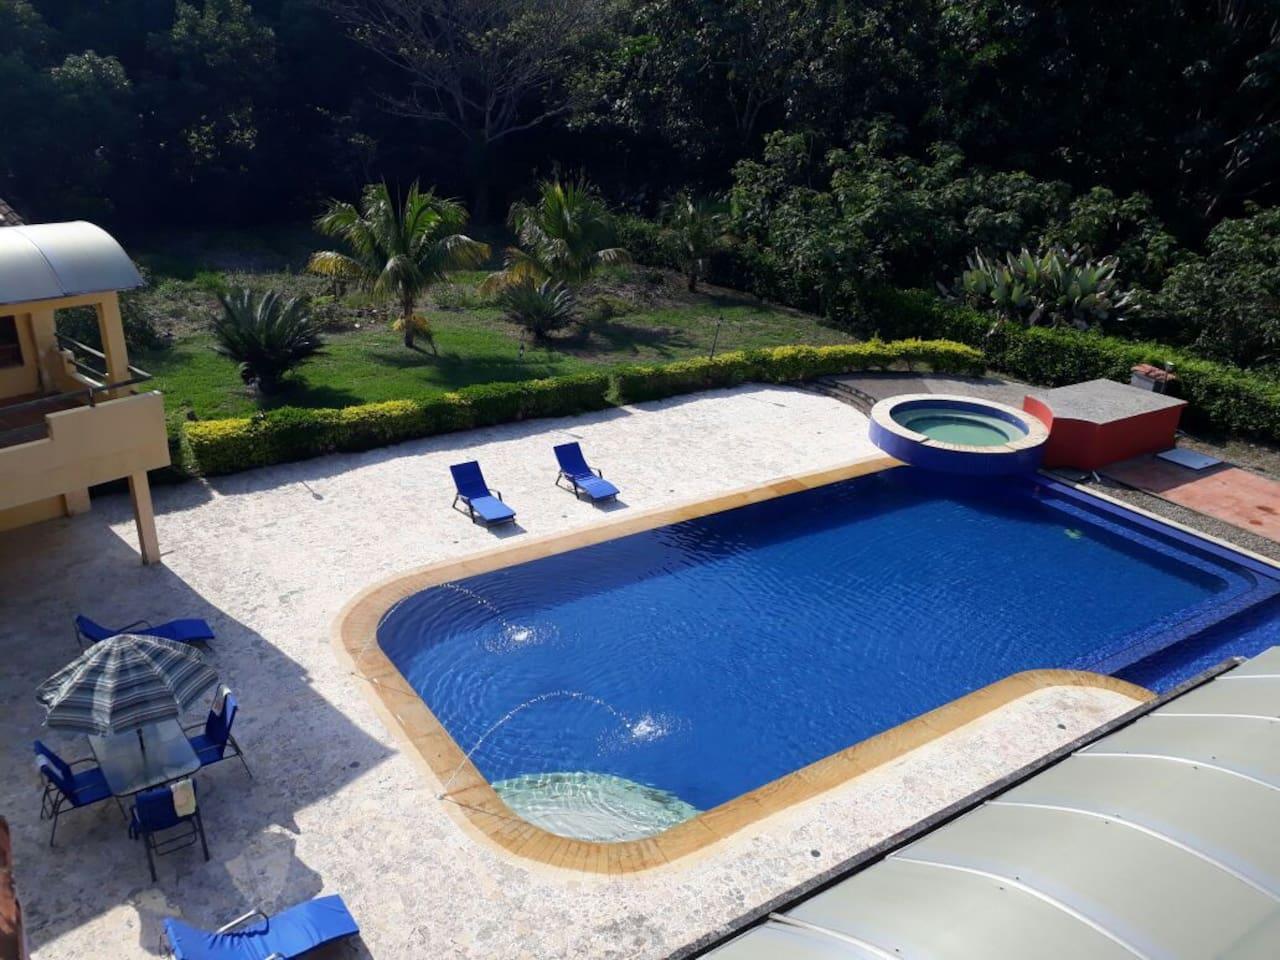 Piscina muy grande con piscina para niños separada por debajo del agua. // Huge pool with a Kids pool that is divided underwater.